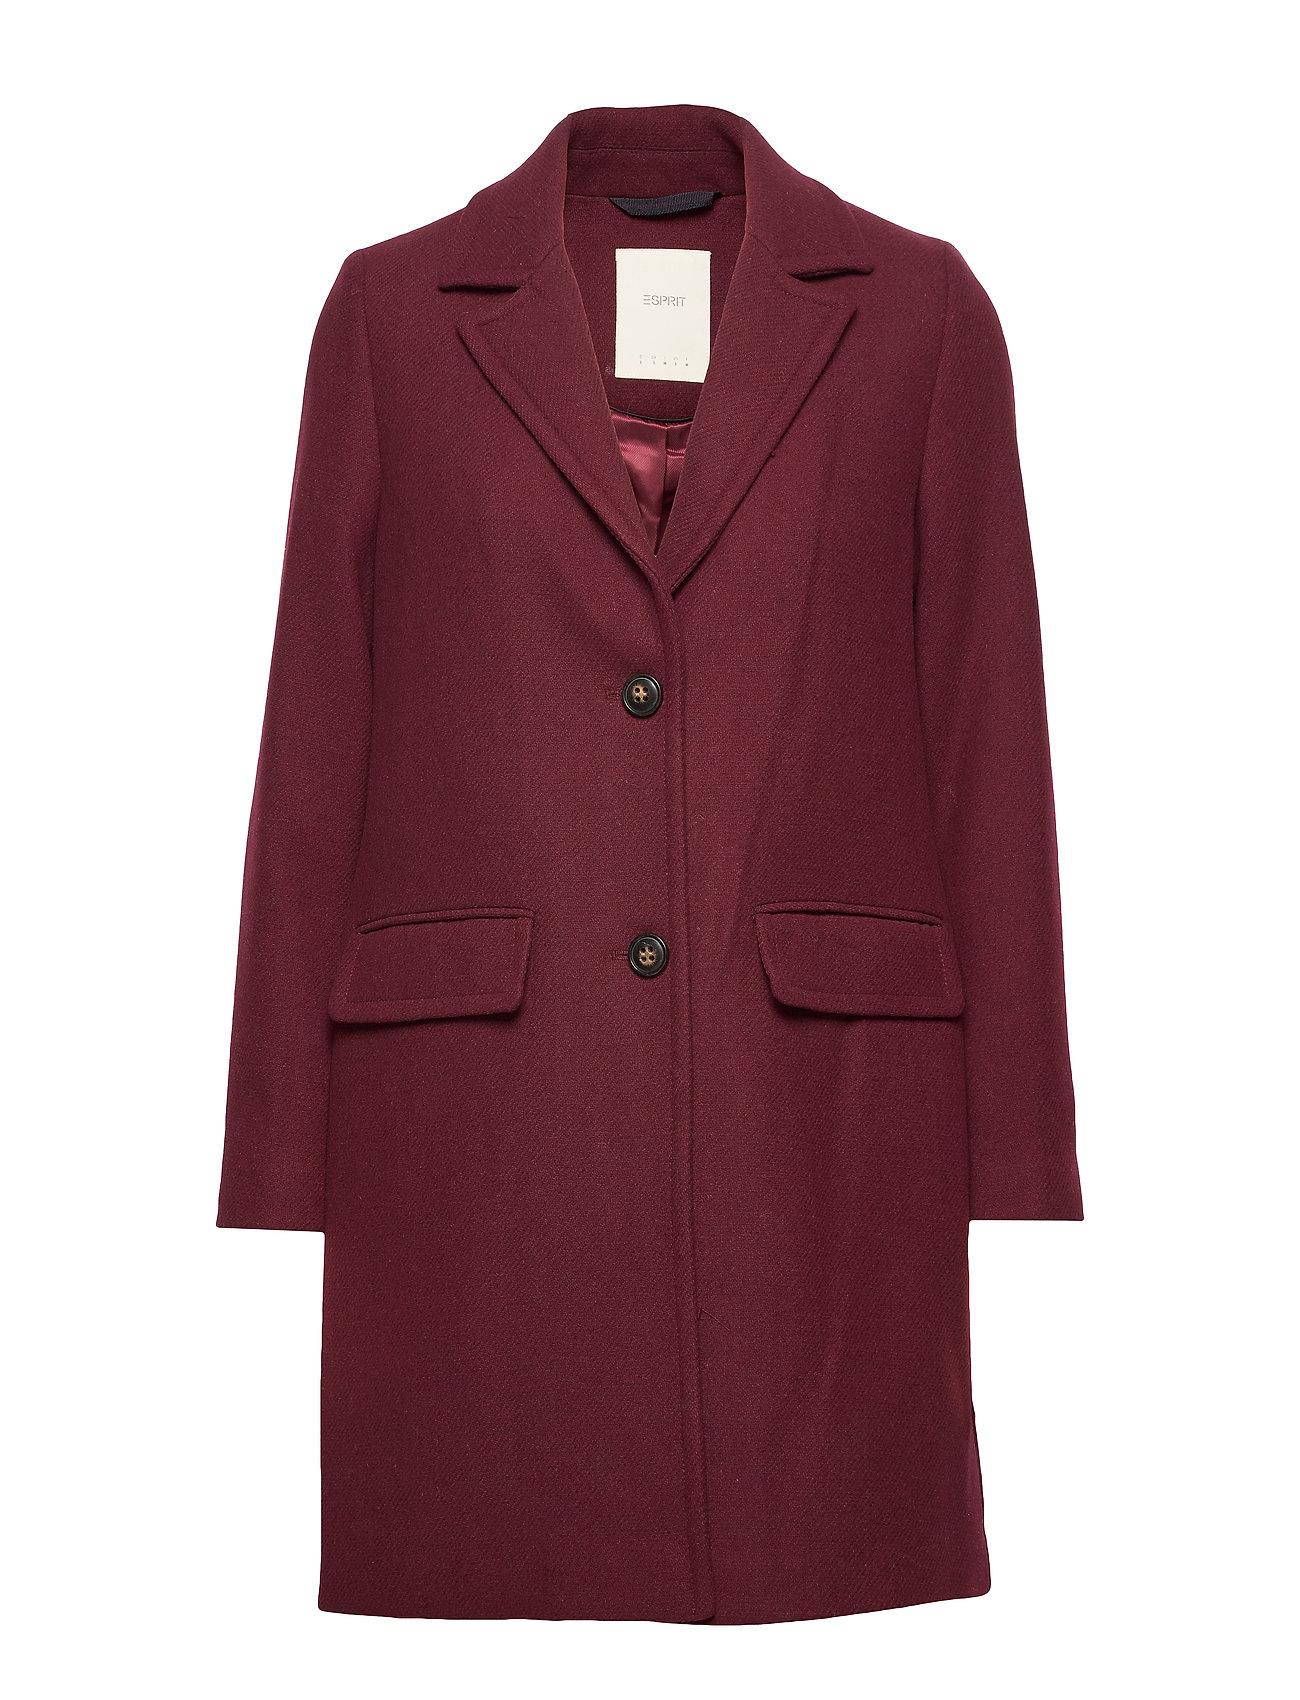 Esprit Casual Coats woven - BORDEAUX RED